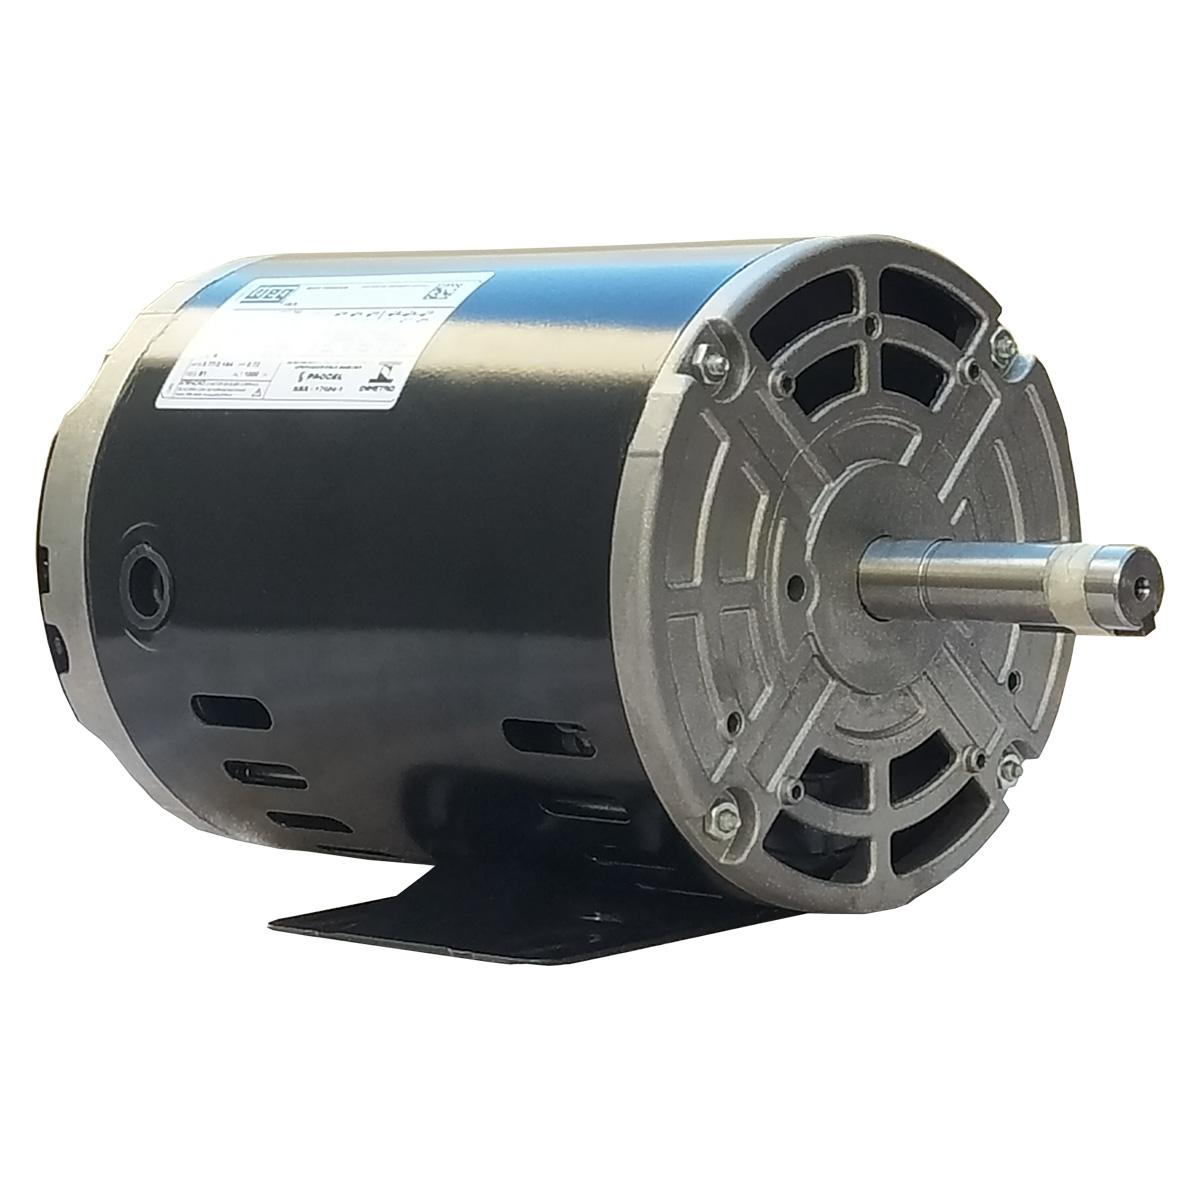 Motor Elétrico Trifásico 3CV 4 Polos Baixa Rotação 220/380v Aberto IP21 Weg IR3